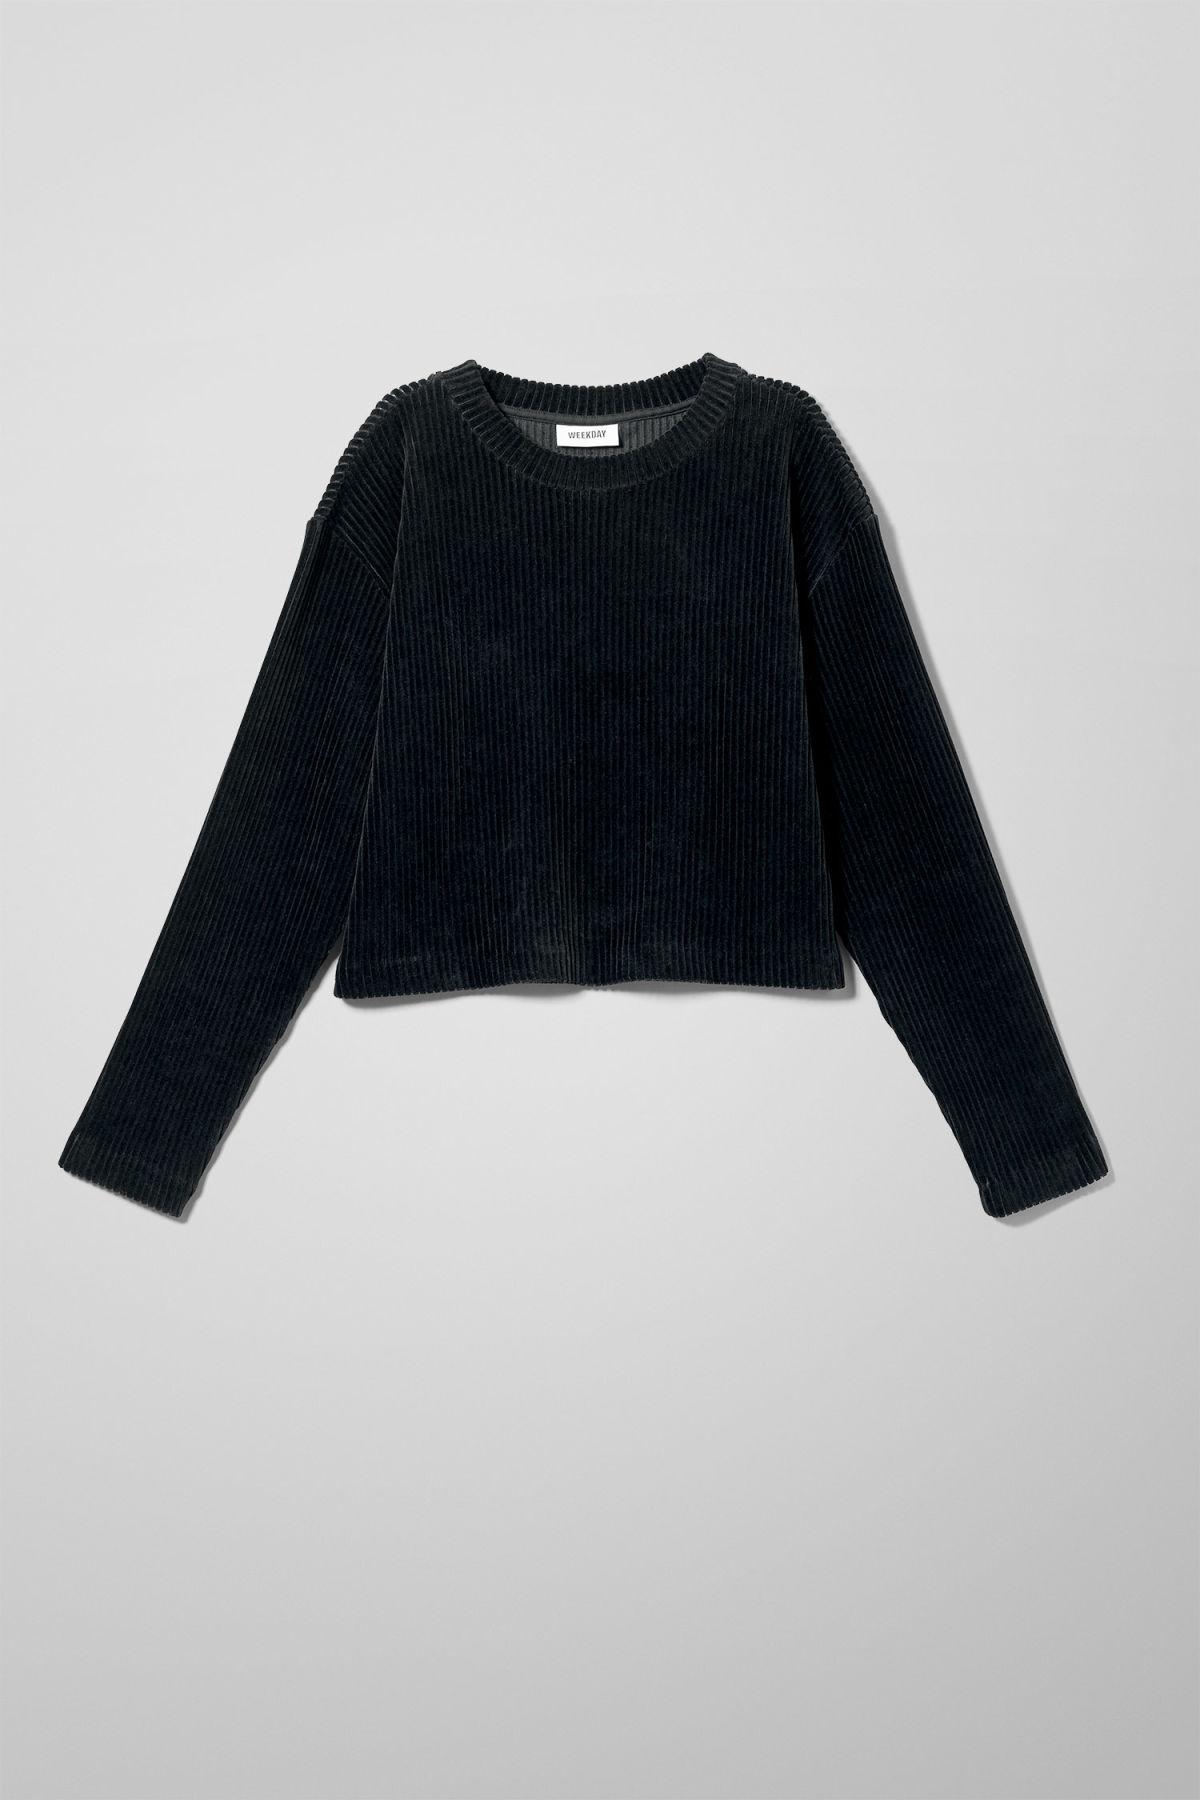 Image of Shea Long Sleeve Top - Black-XS